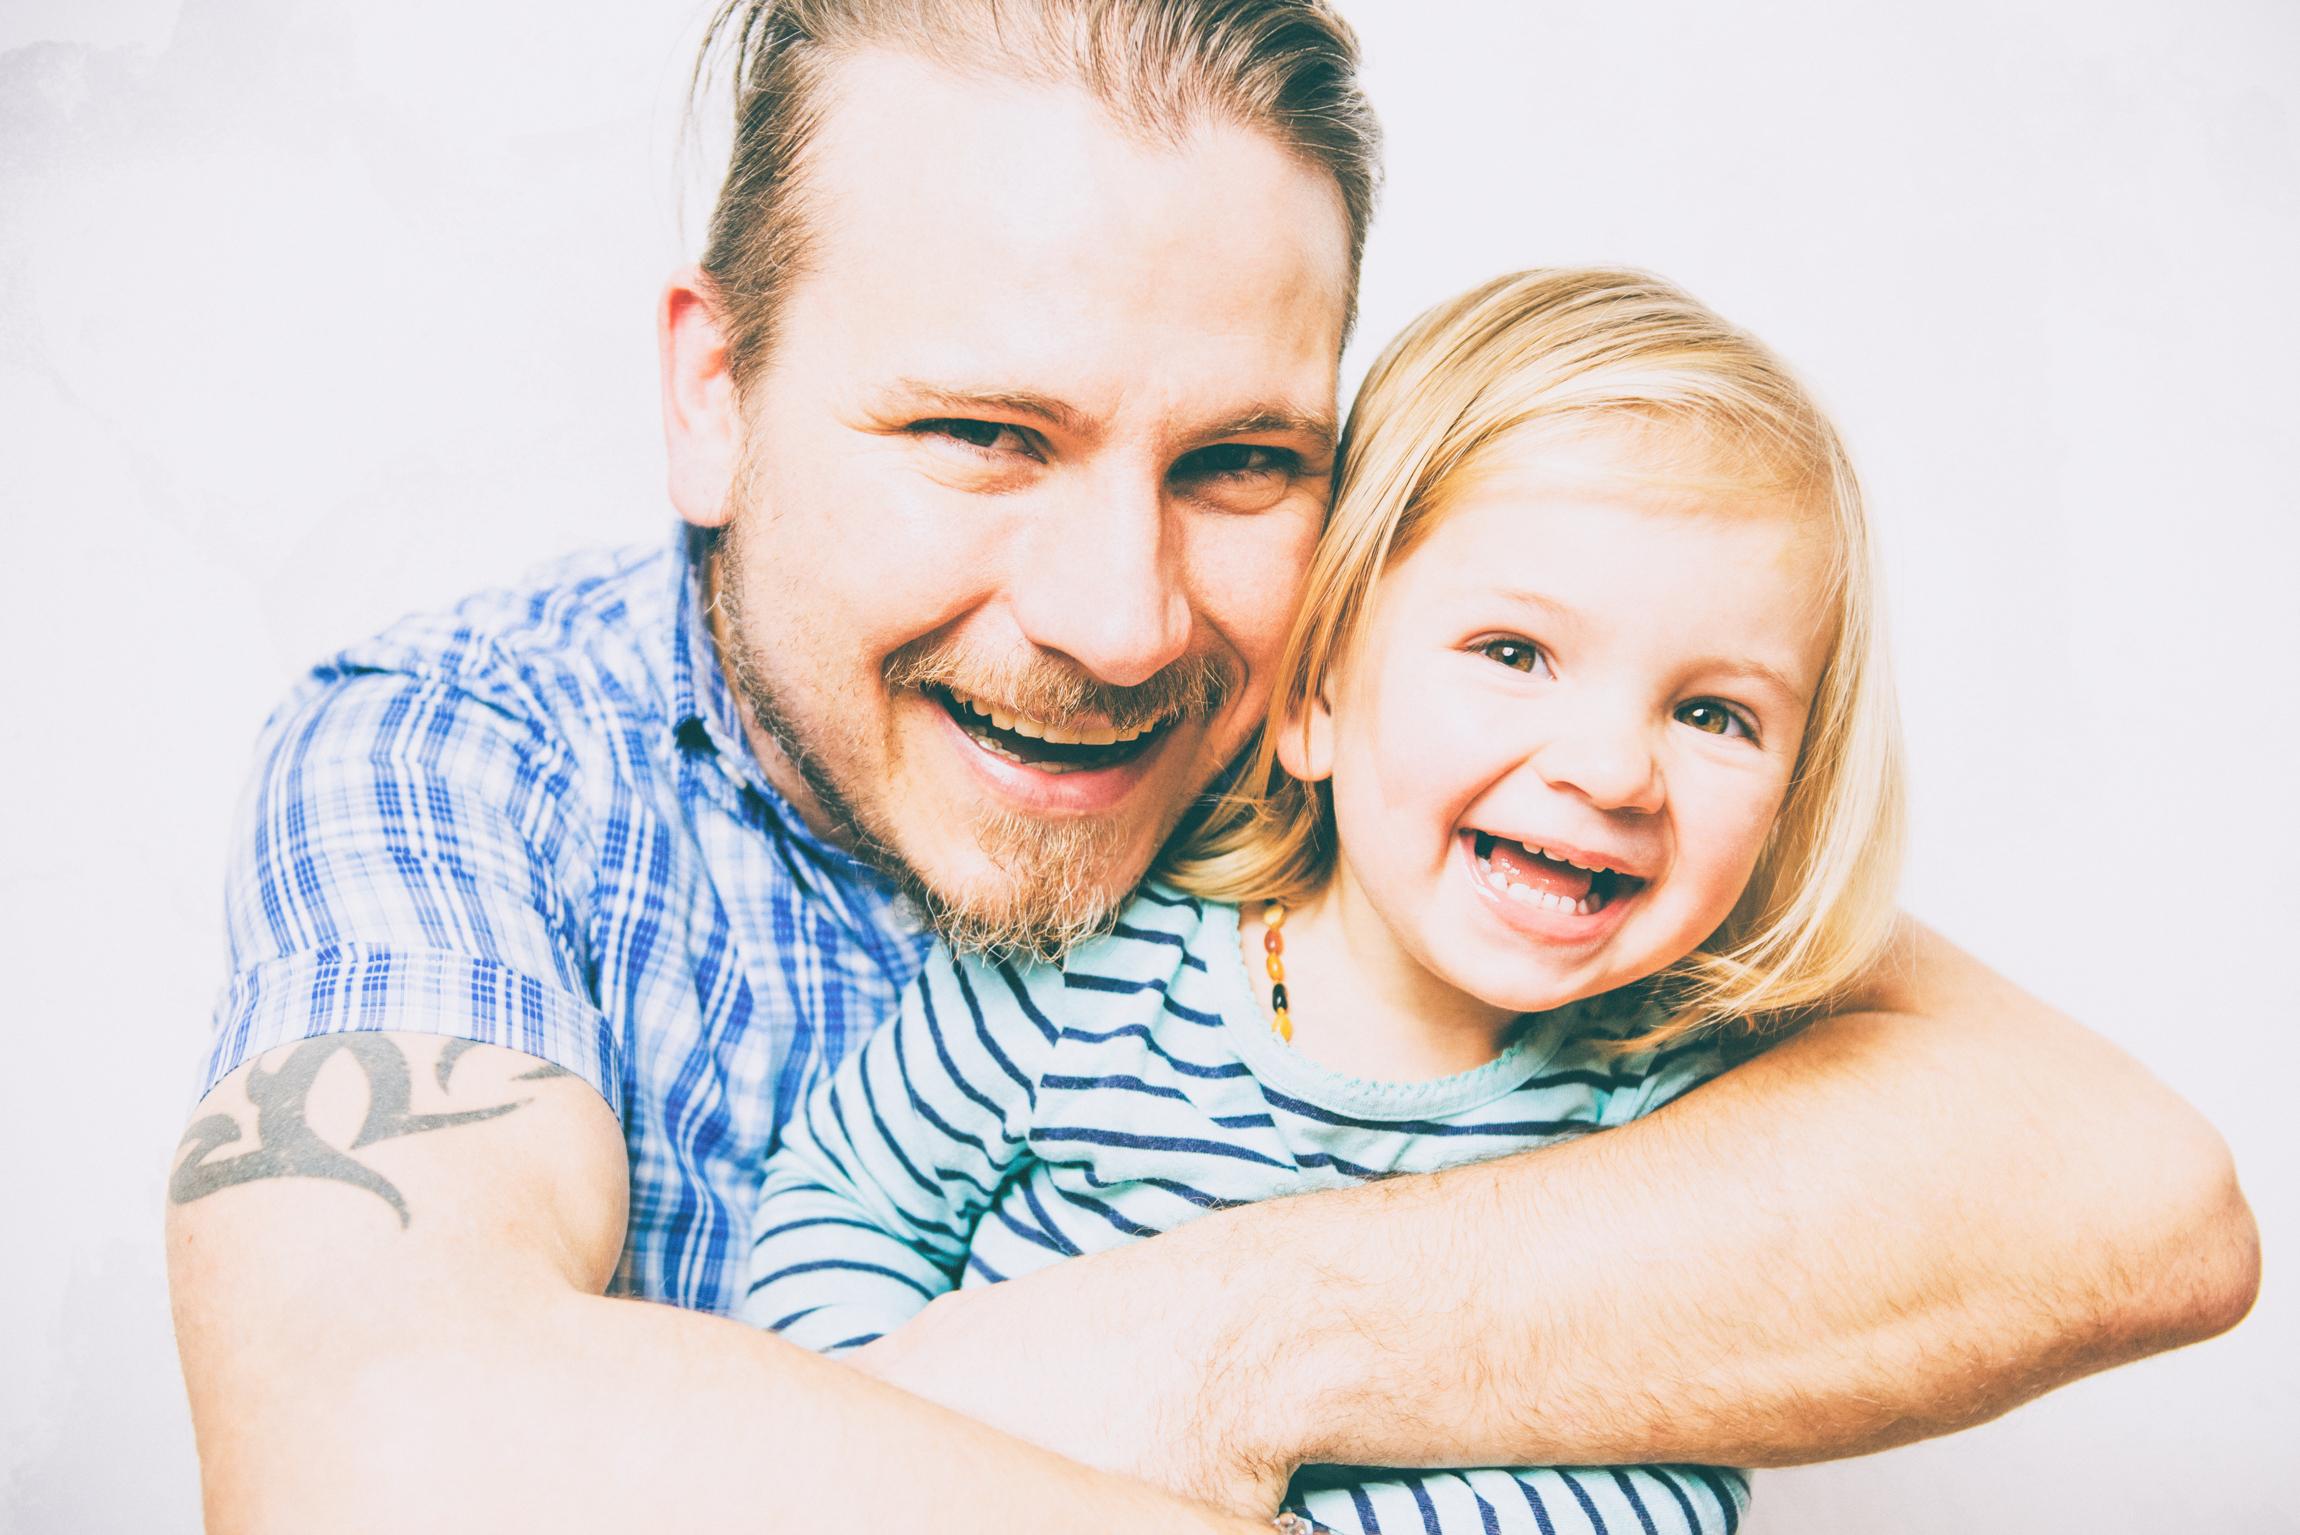 Vater umarmt kleine Tochter